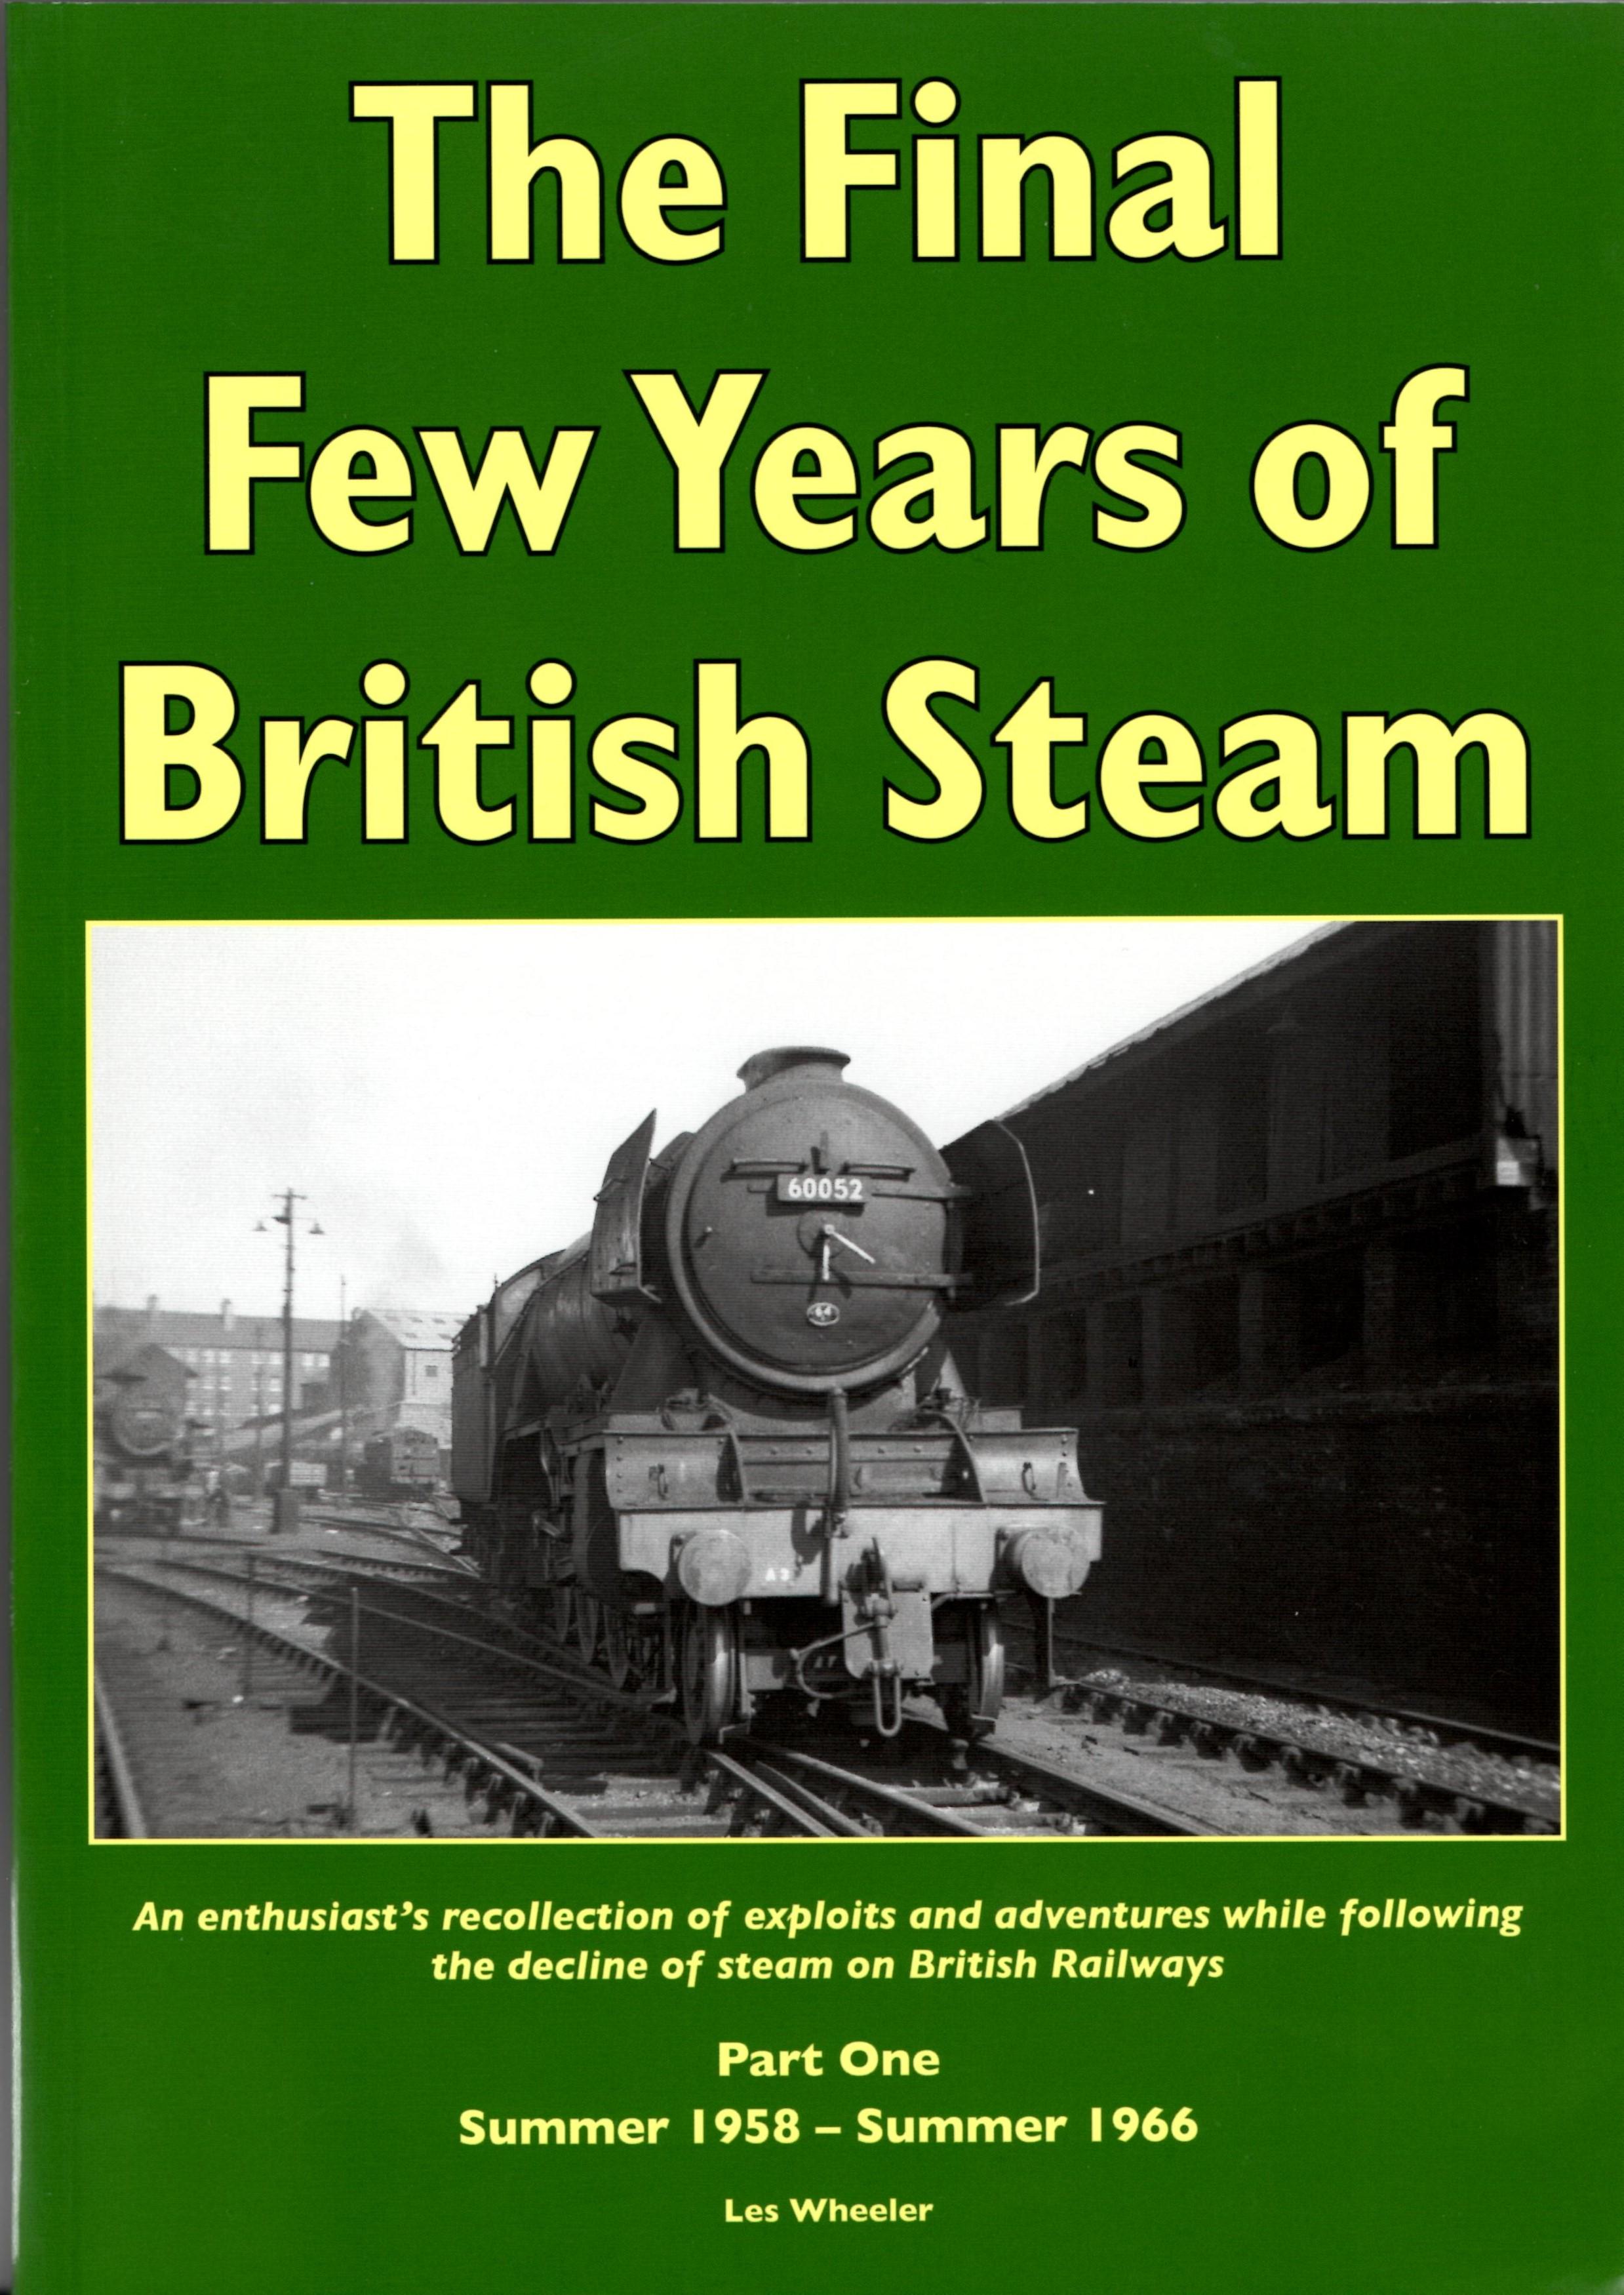 The Final Few Years of British Steam, Part 1: Summer 1958-Summer 1966